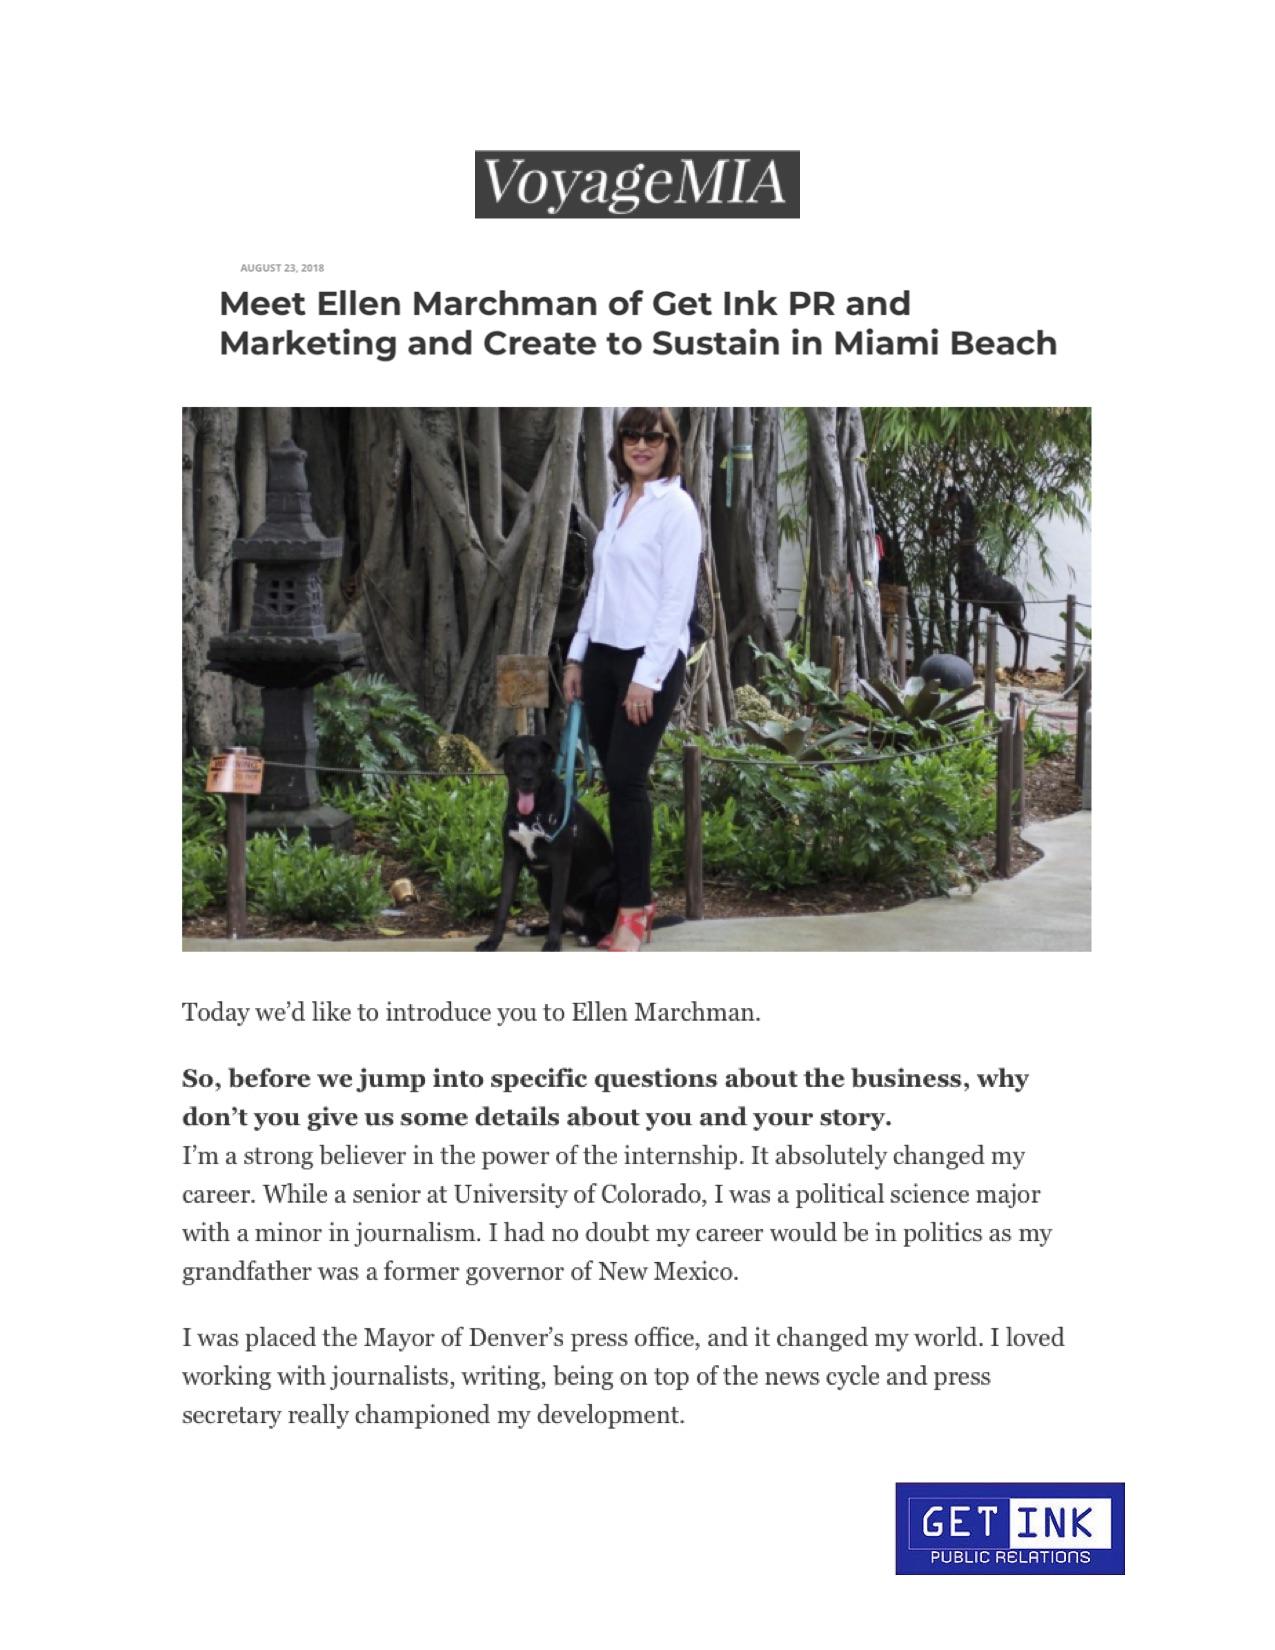 Ellen Marchman and Luna in VoyageMIA - Get Ink Pr